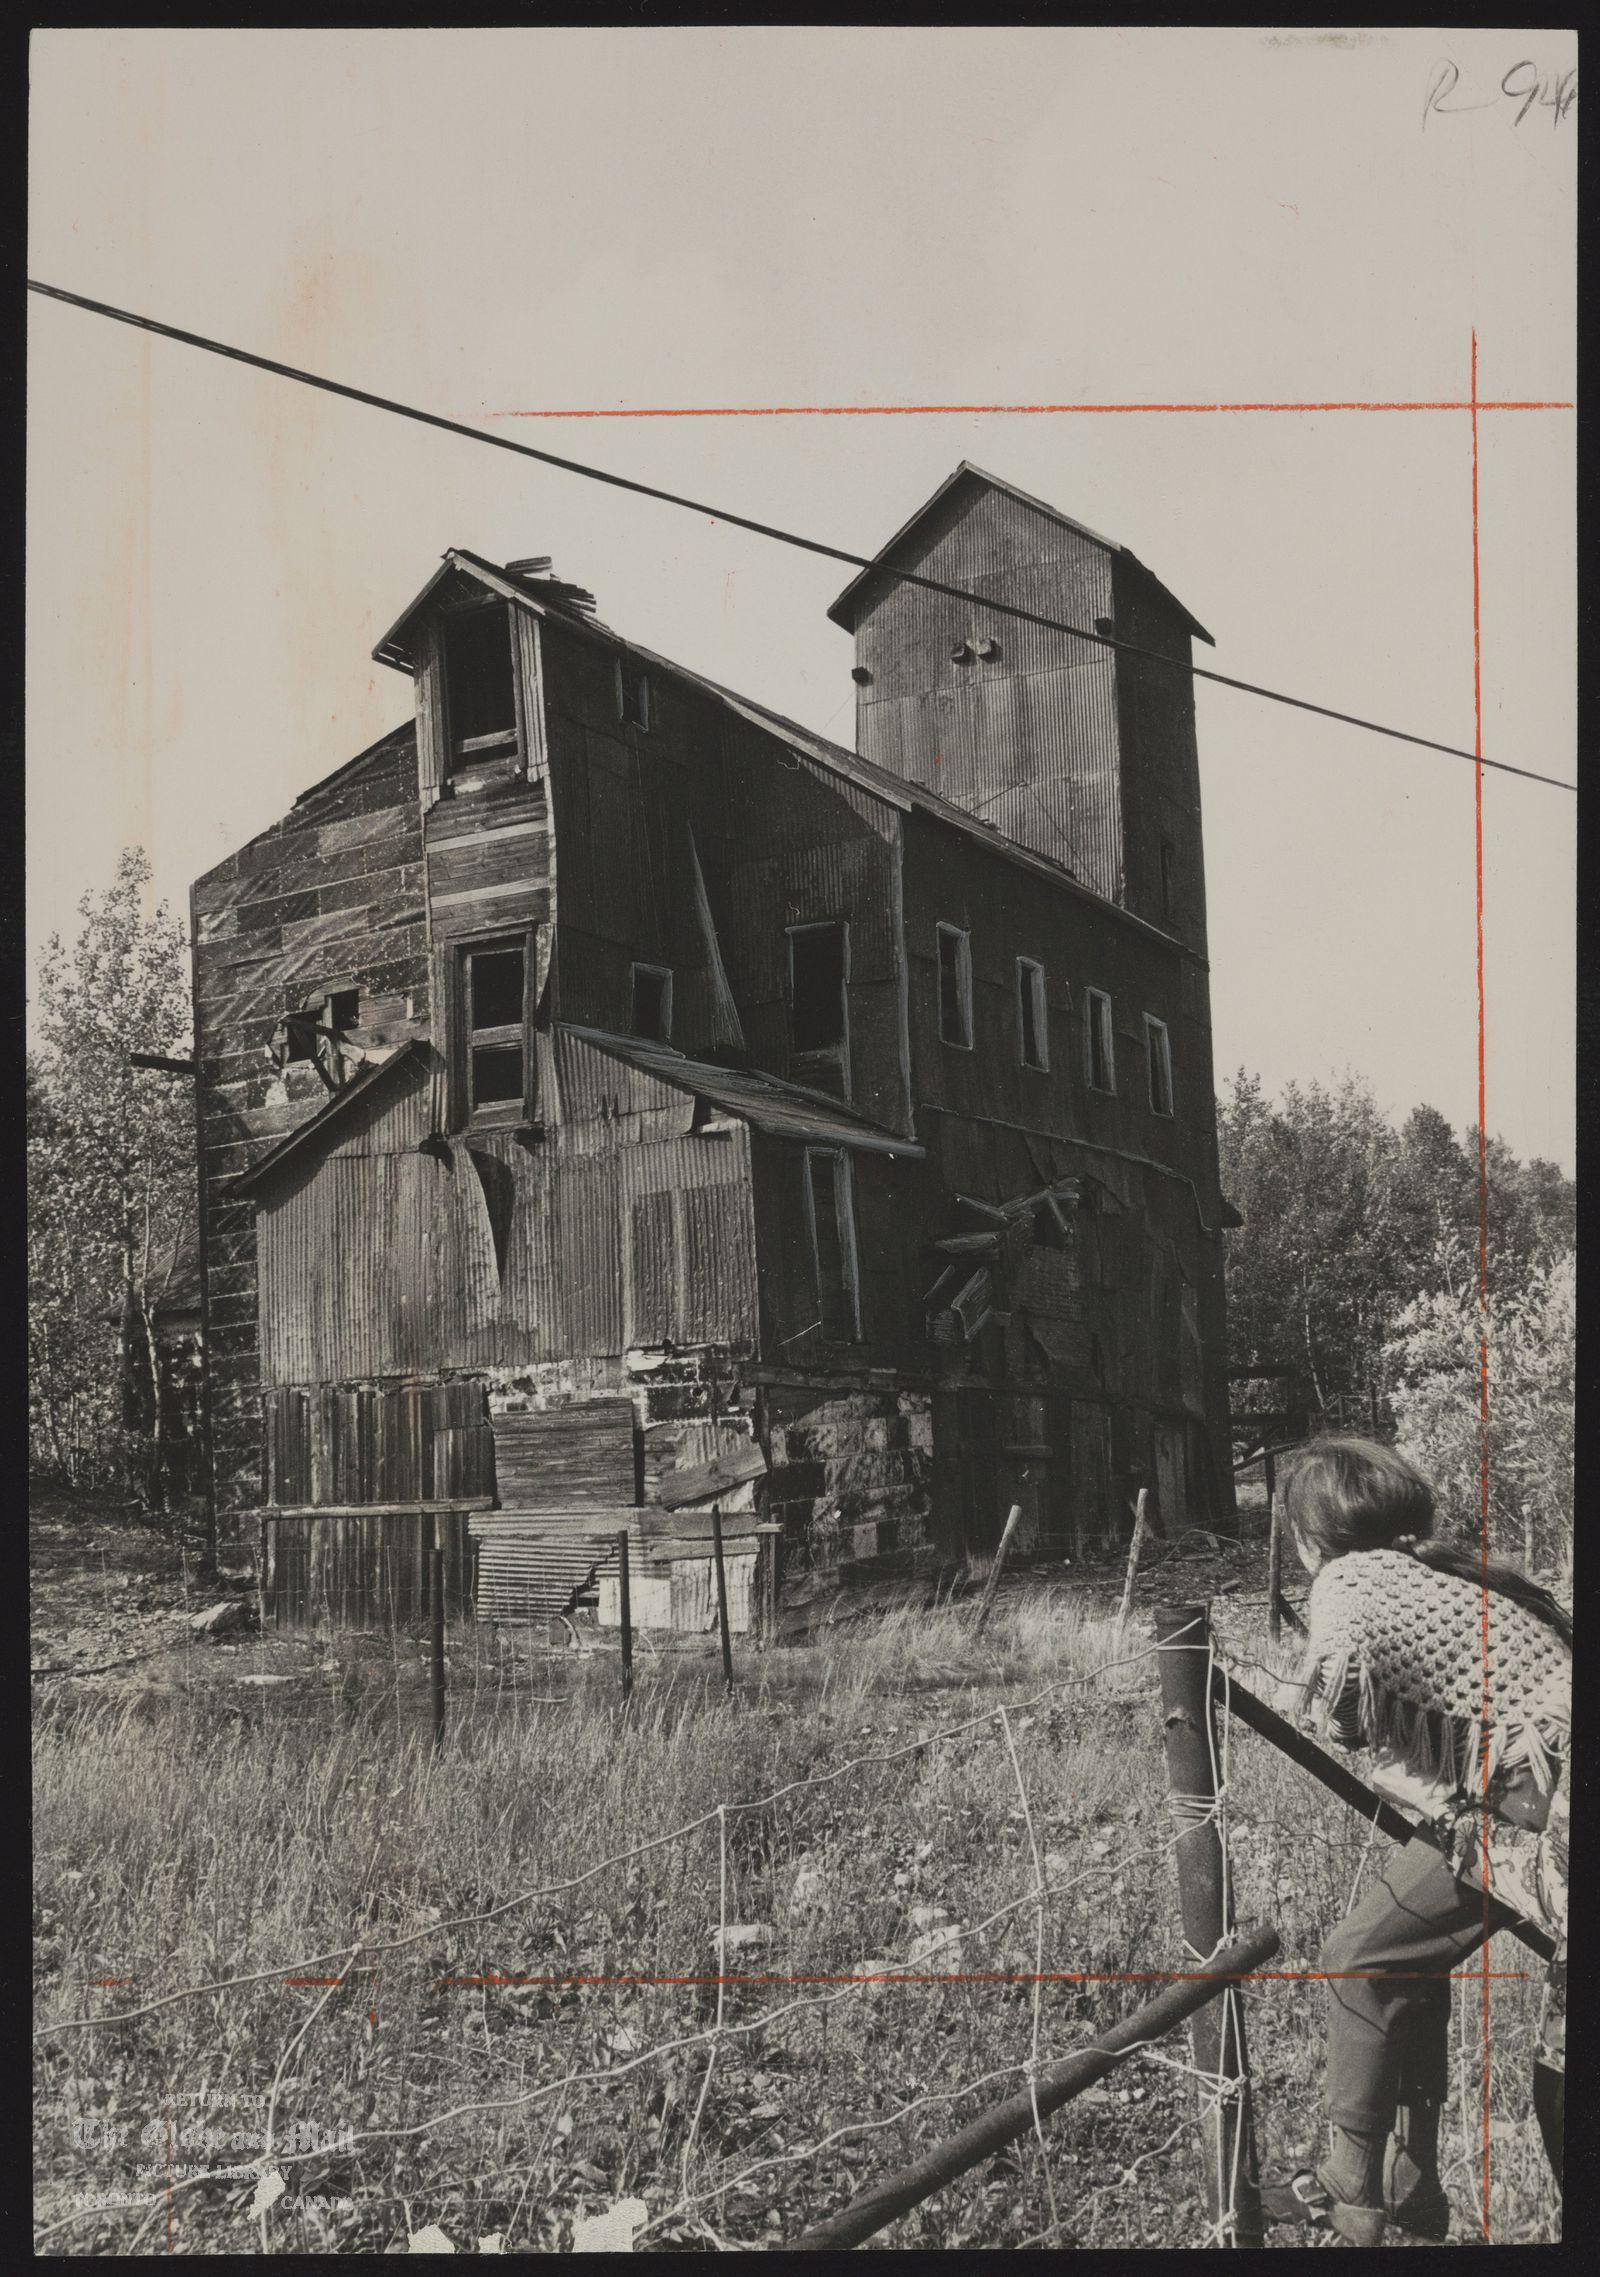 COBALT town (Ontario) (Abandonded mineshaft)